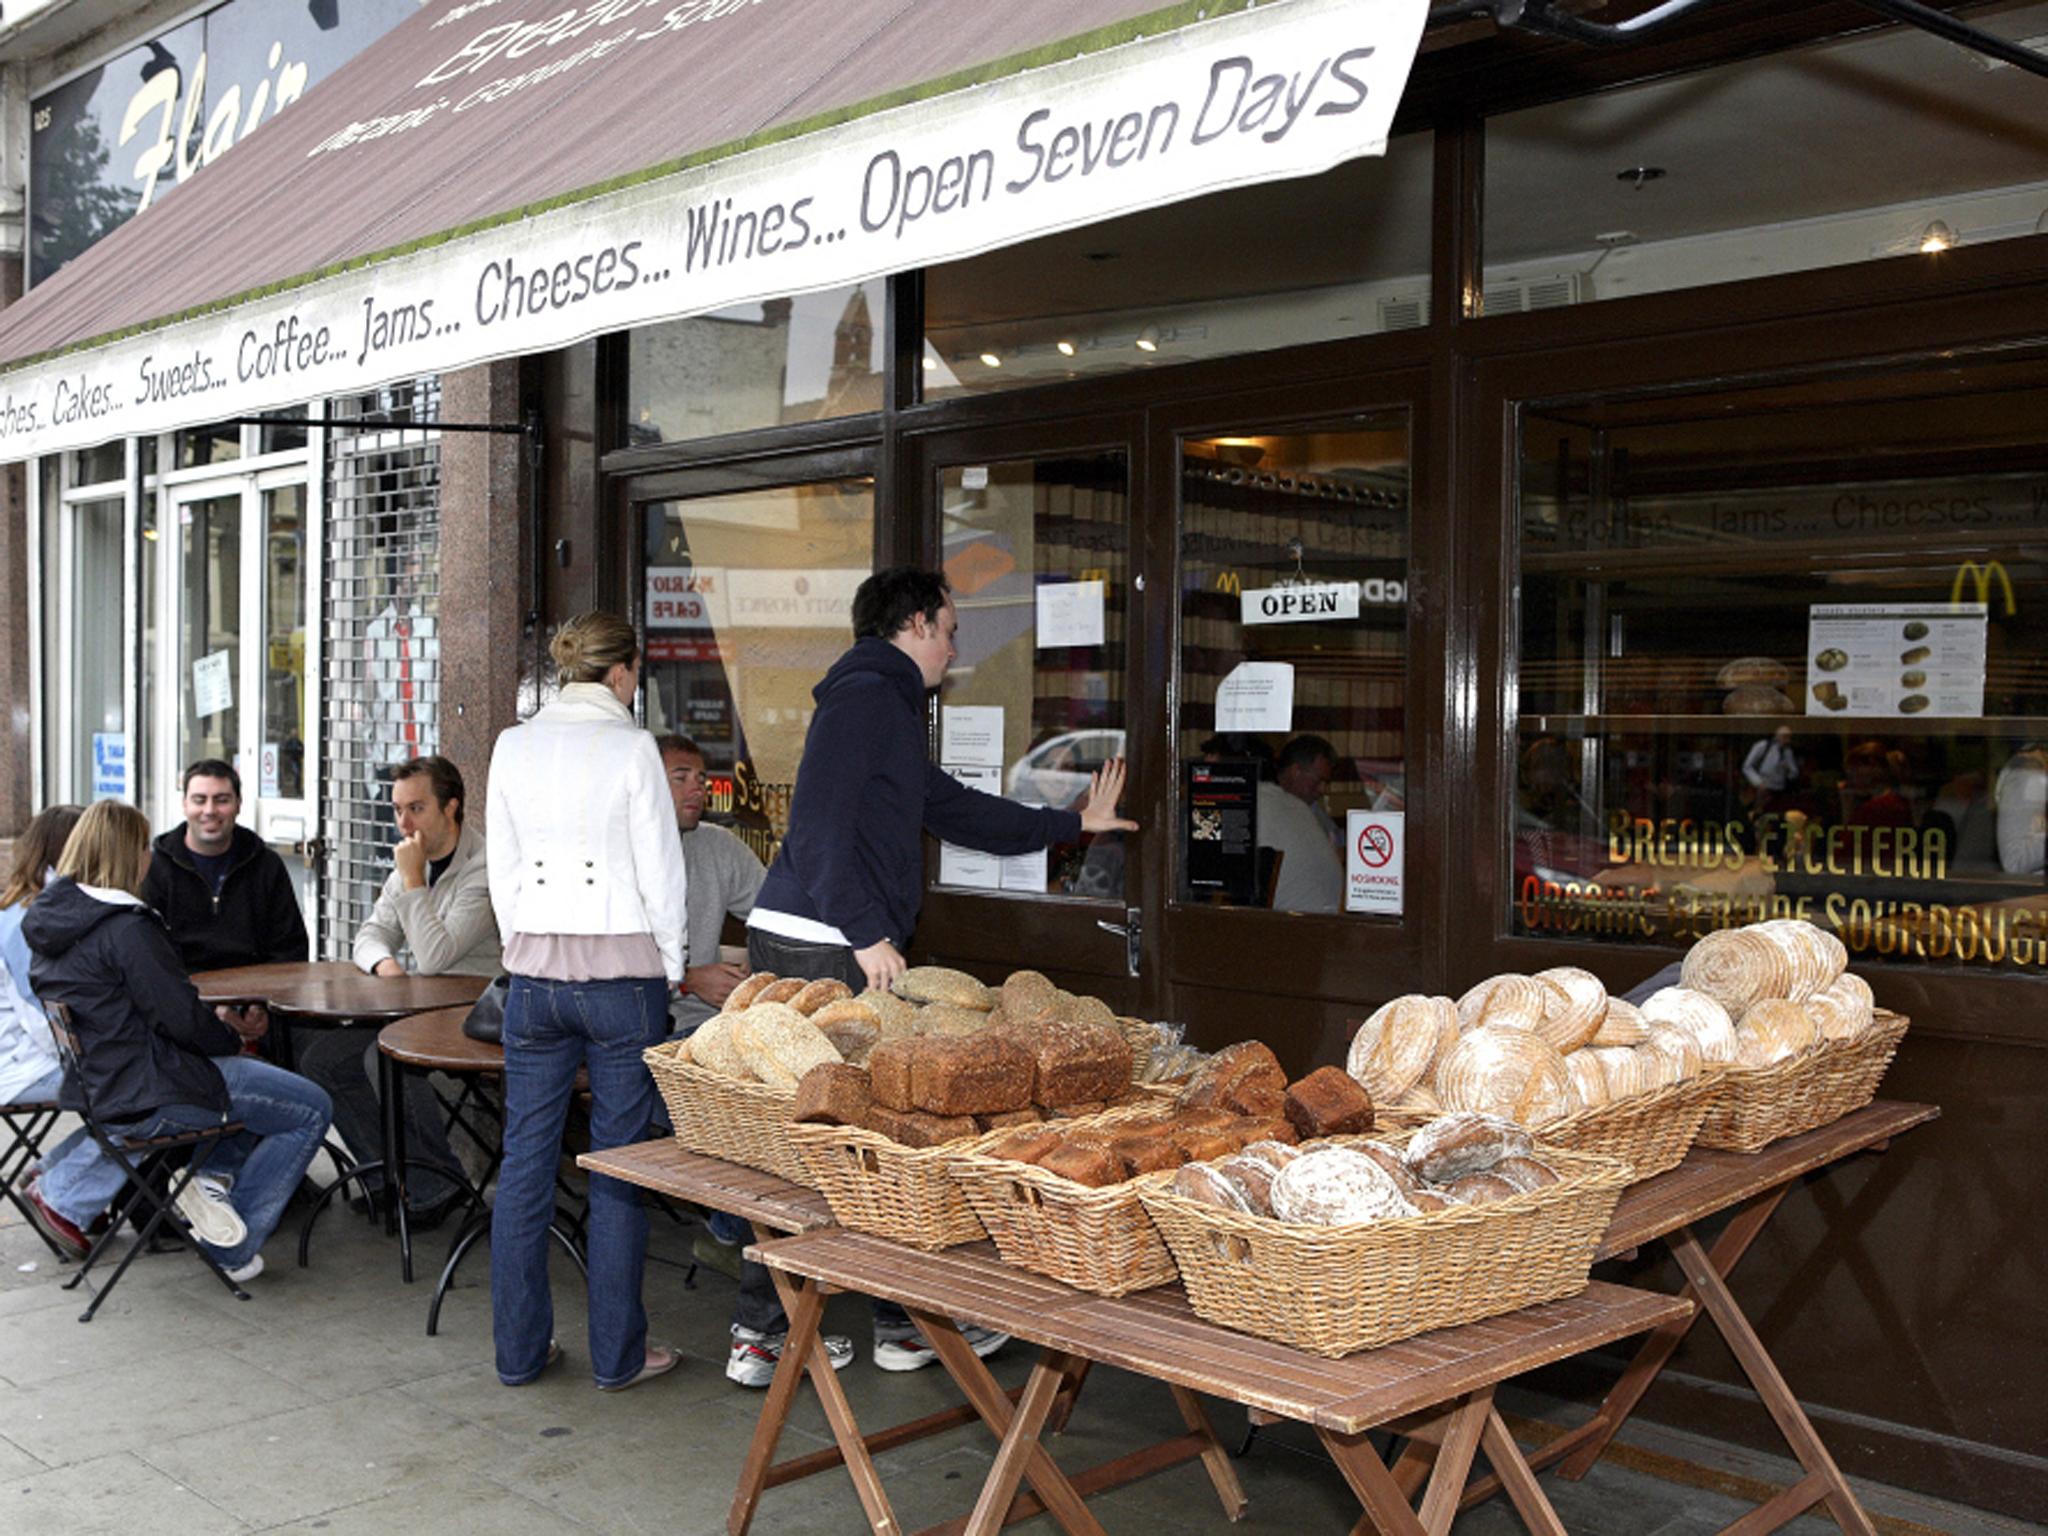 Breads Etcetera